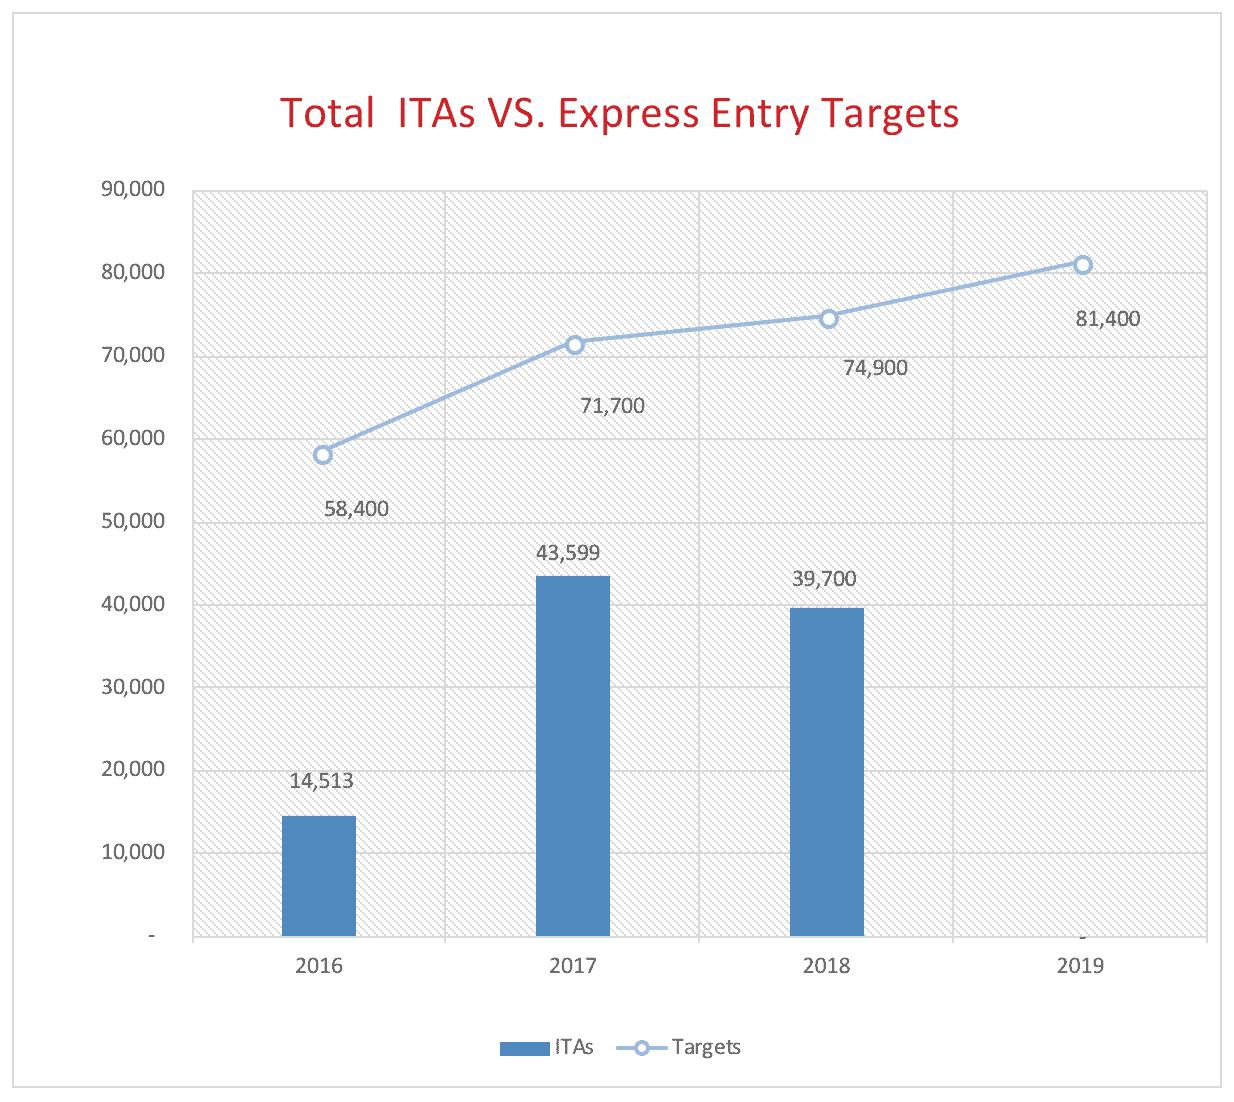 Total ITAs VS. Express Entry Targets